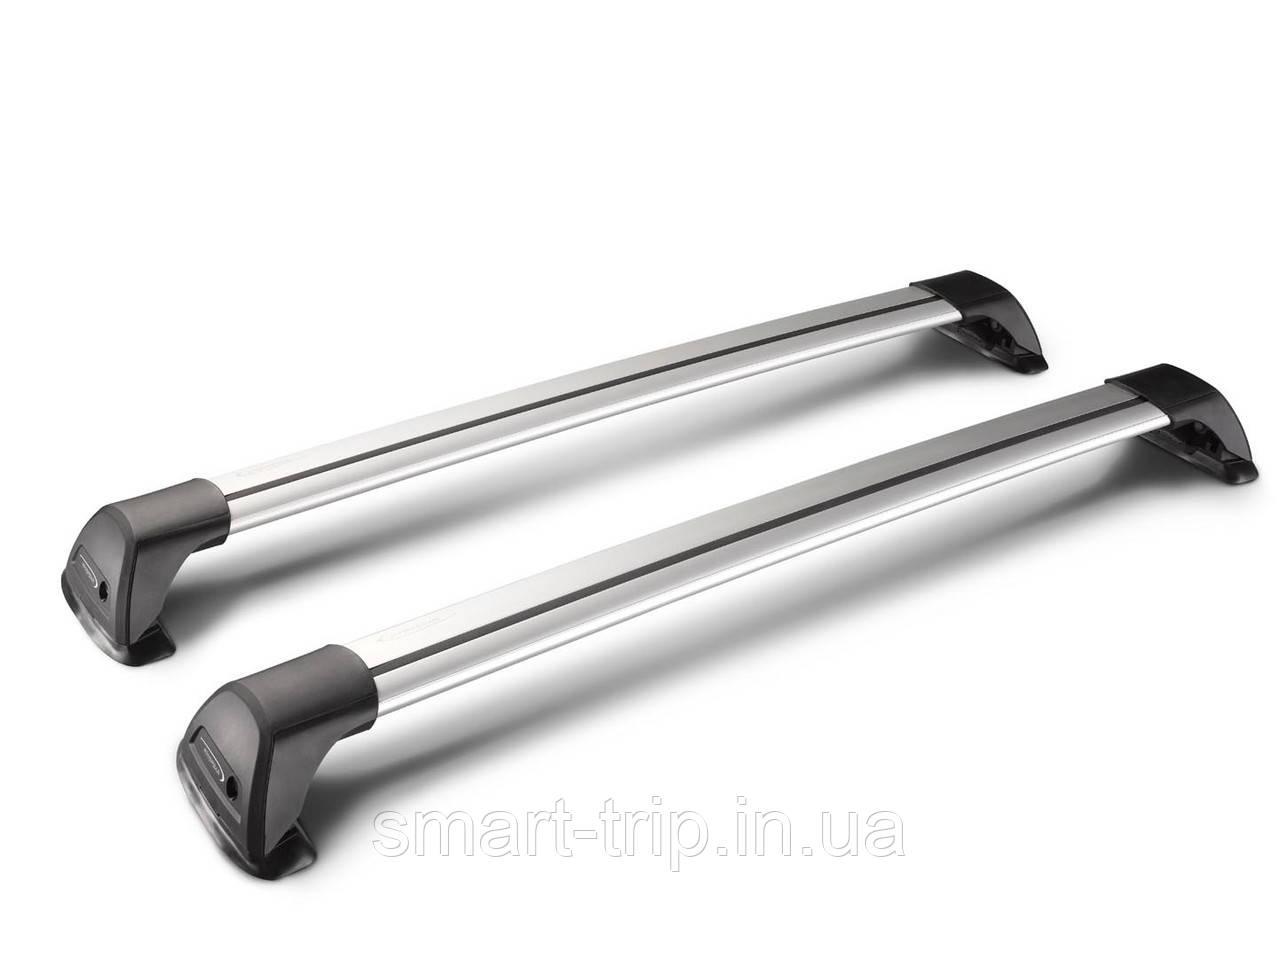 Багажник для авто c гладкой крышей Yakima Whispbar FlushBar S37 (105/115 см) silver